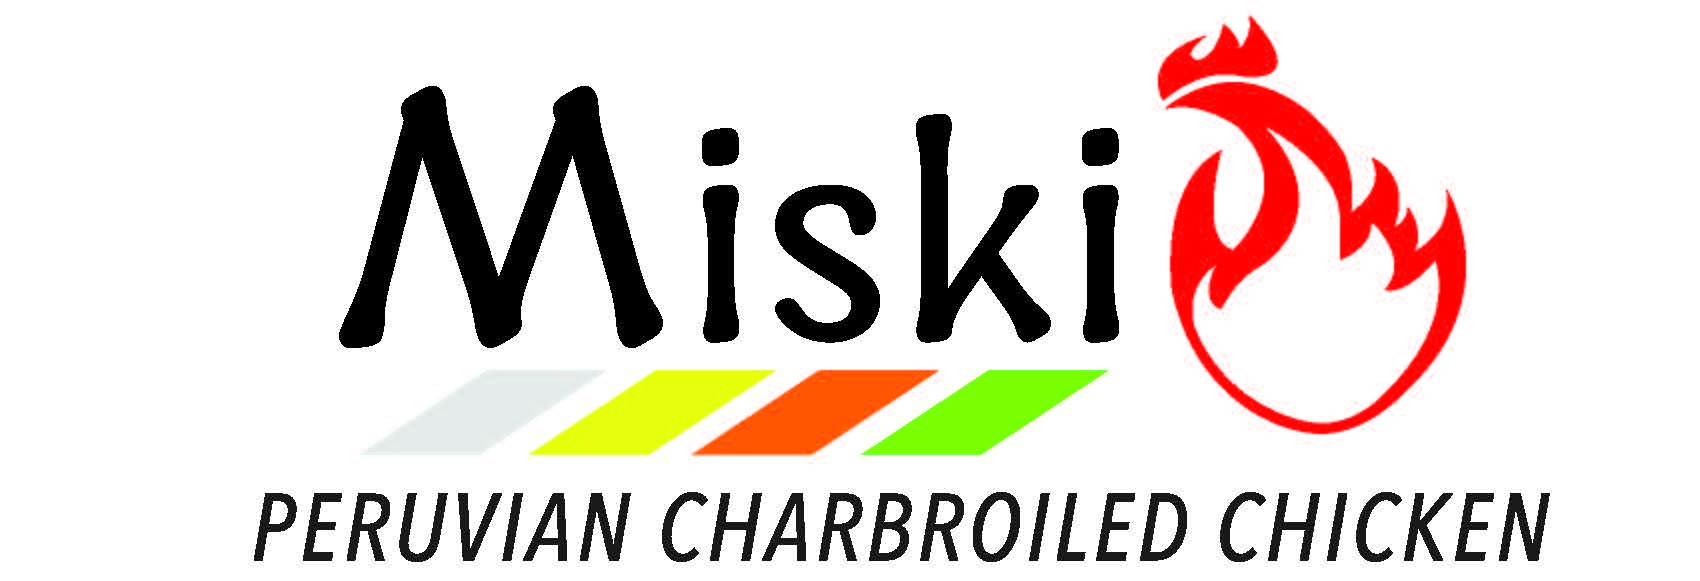 https://growthzonesitesprod.azureedge.net/wp-content/uploads/sites/803/2020/10/Miski-Logo-Rev01.jpg